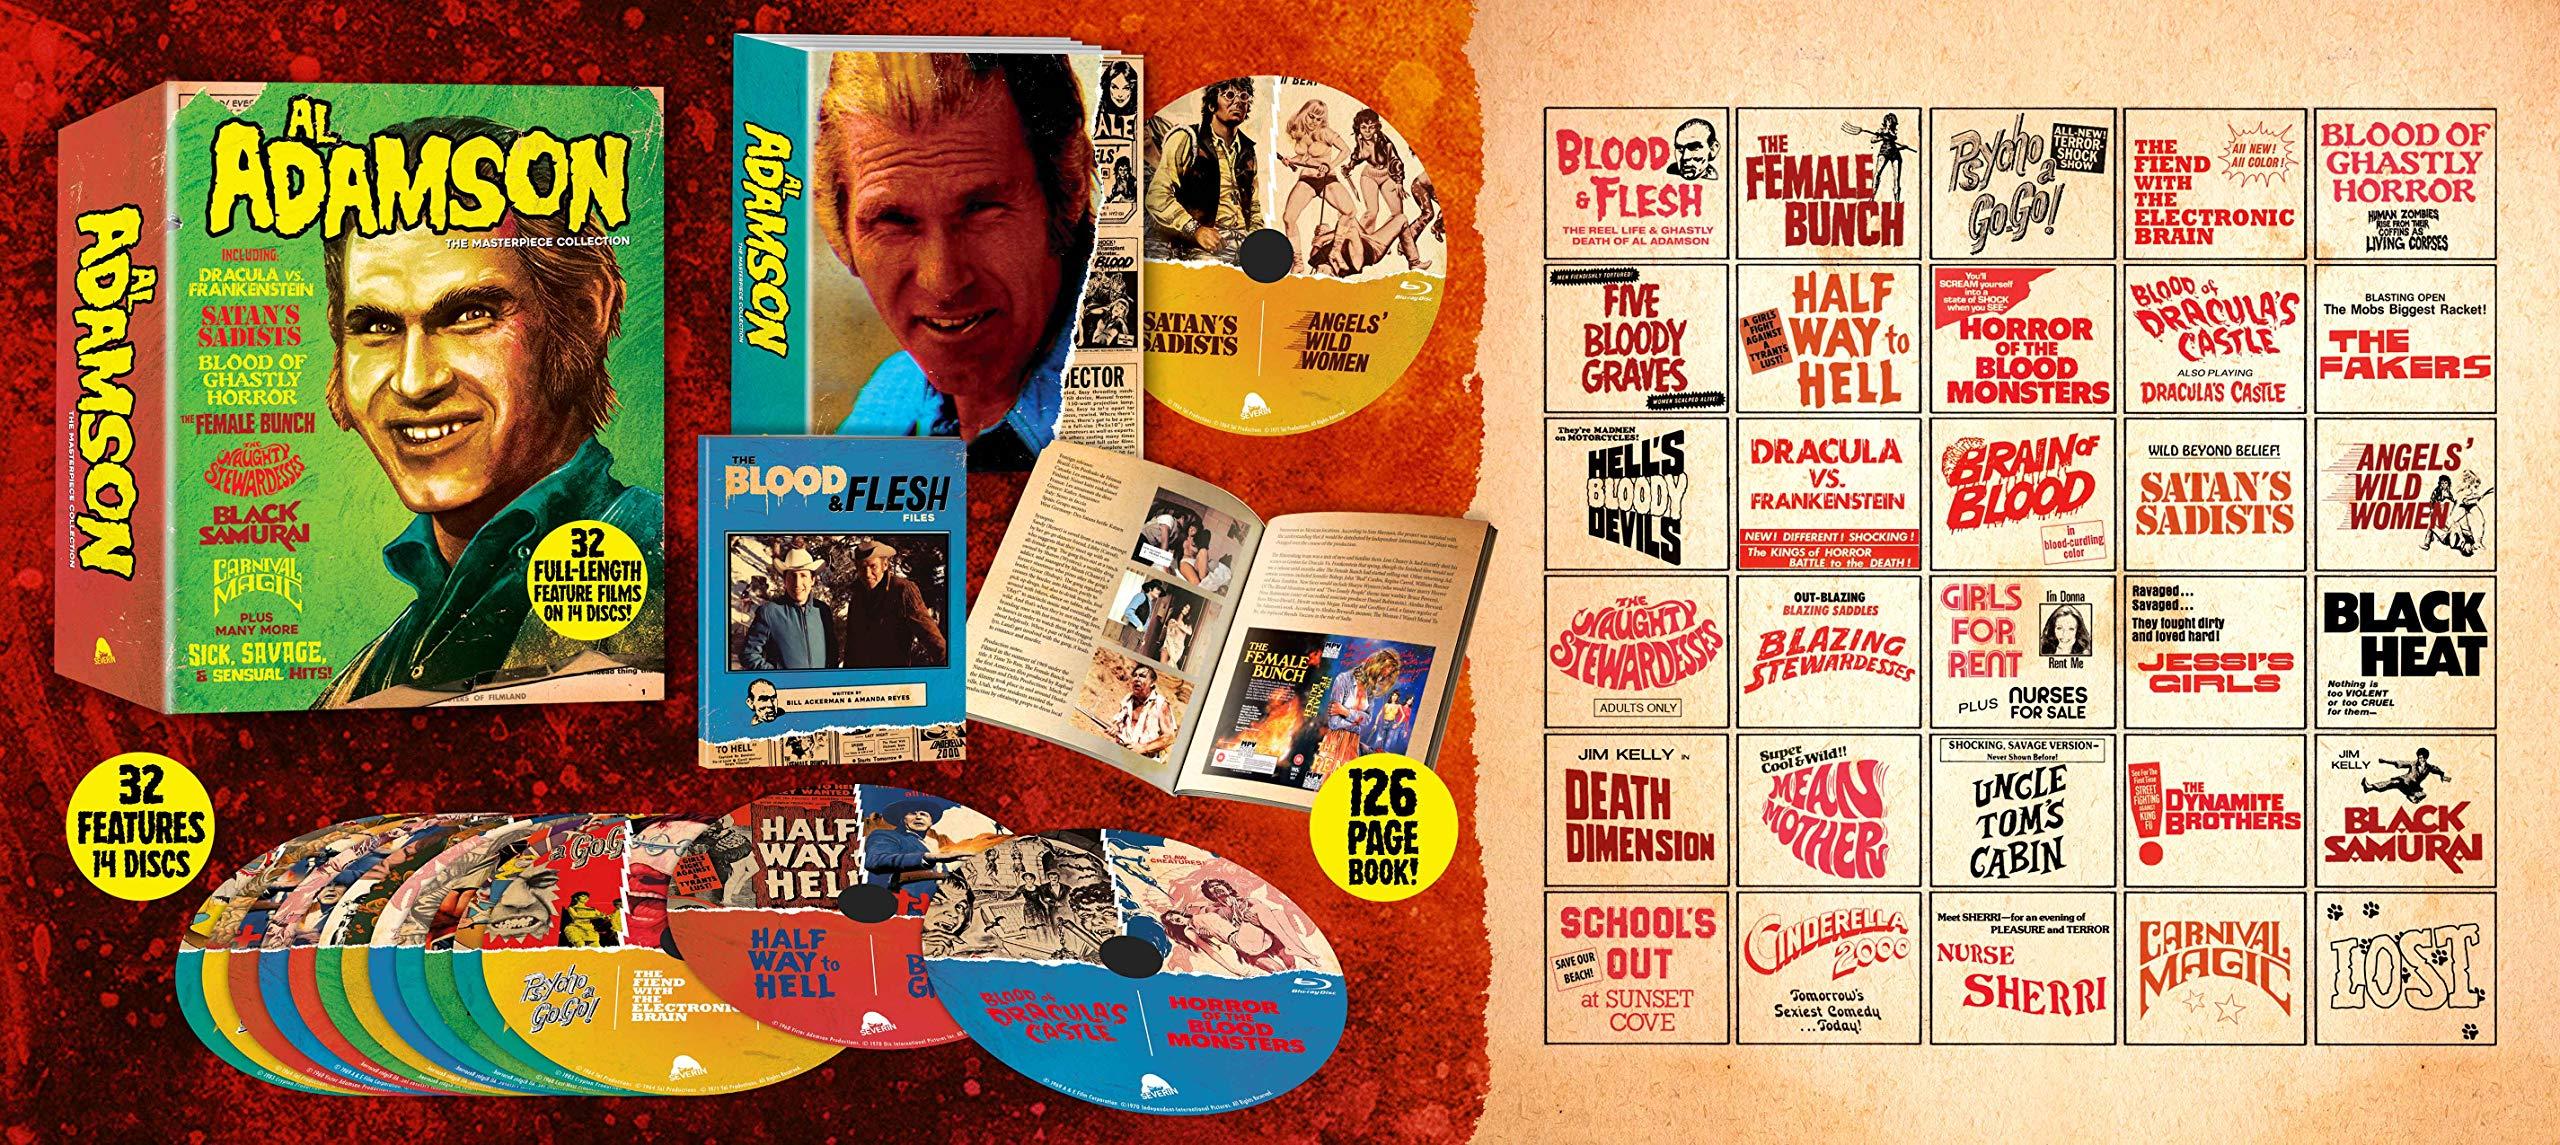 Al Adamson: The Masterpiece Collection [Blu-ray]